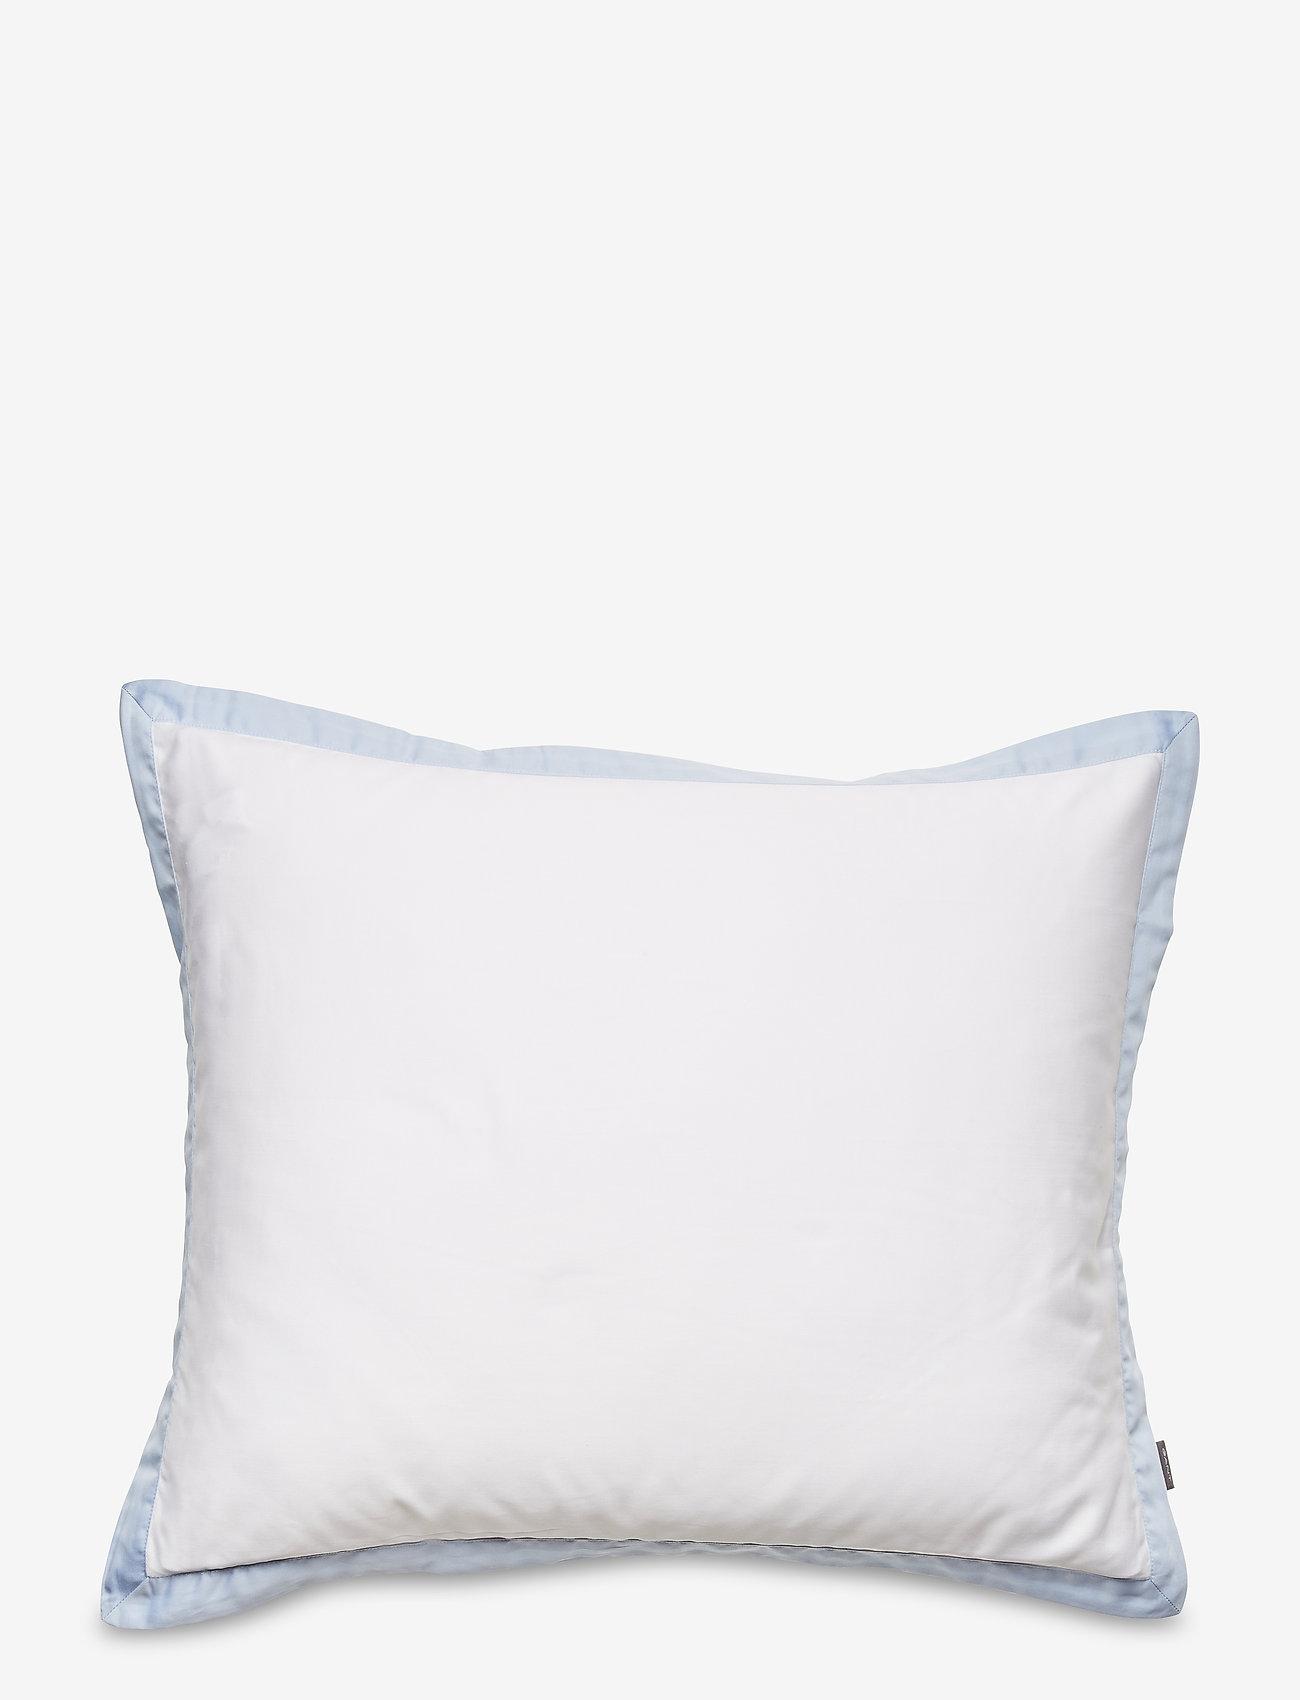 GANT - SATEEN BORDER PILLOWCASE - pillowcases - hamptons blue - 0